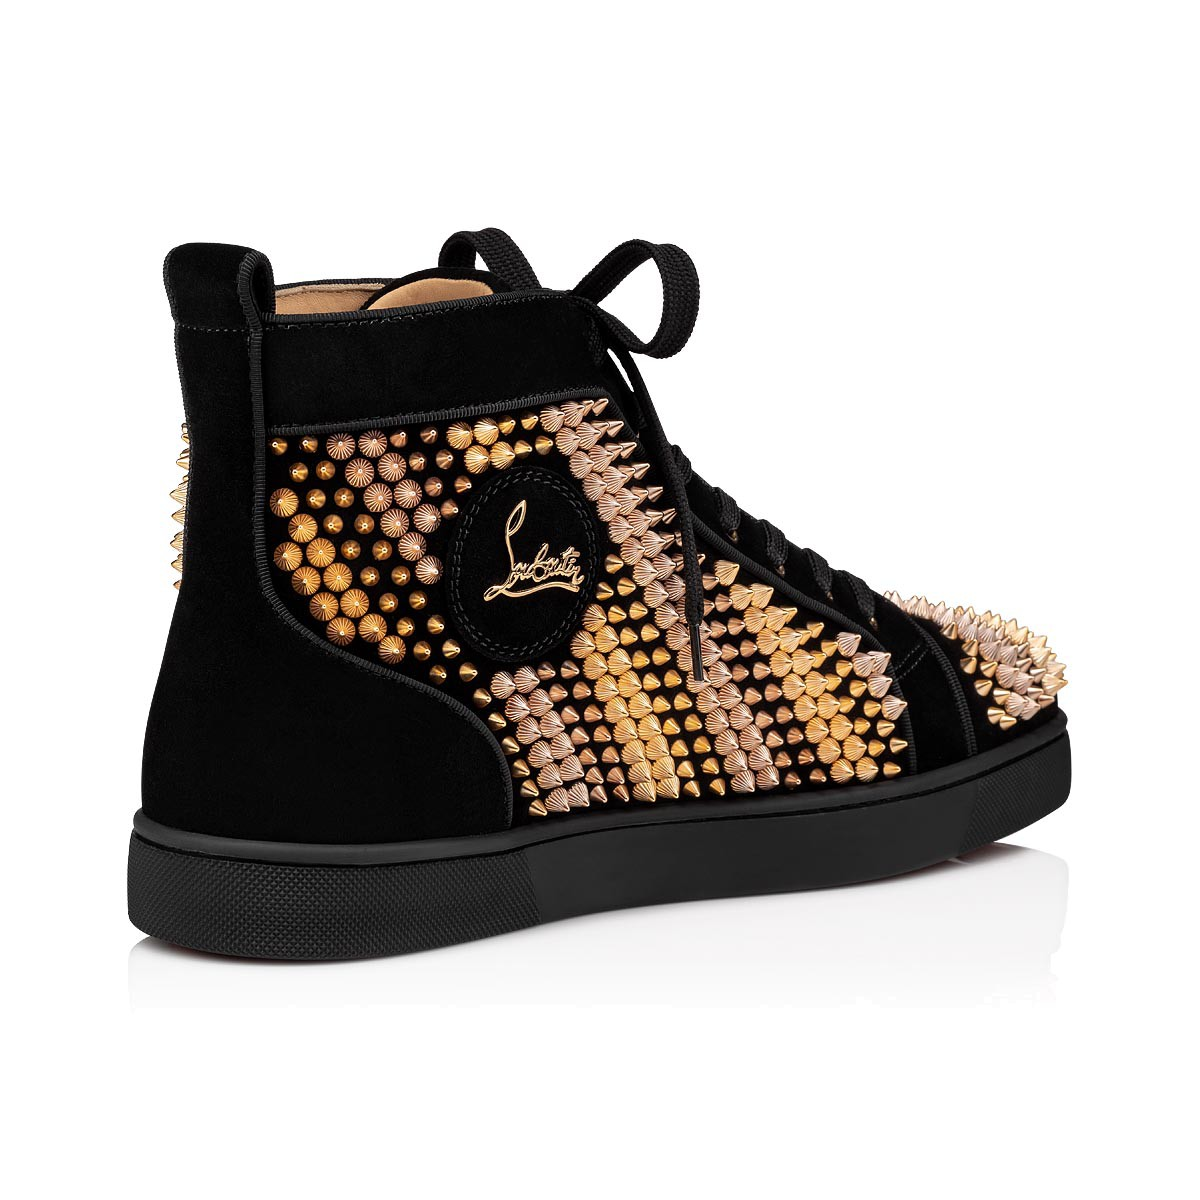 鞋履 - Galvalouis Veau Velours - Christian Louboutin